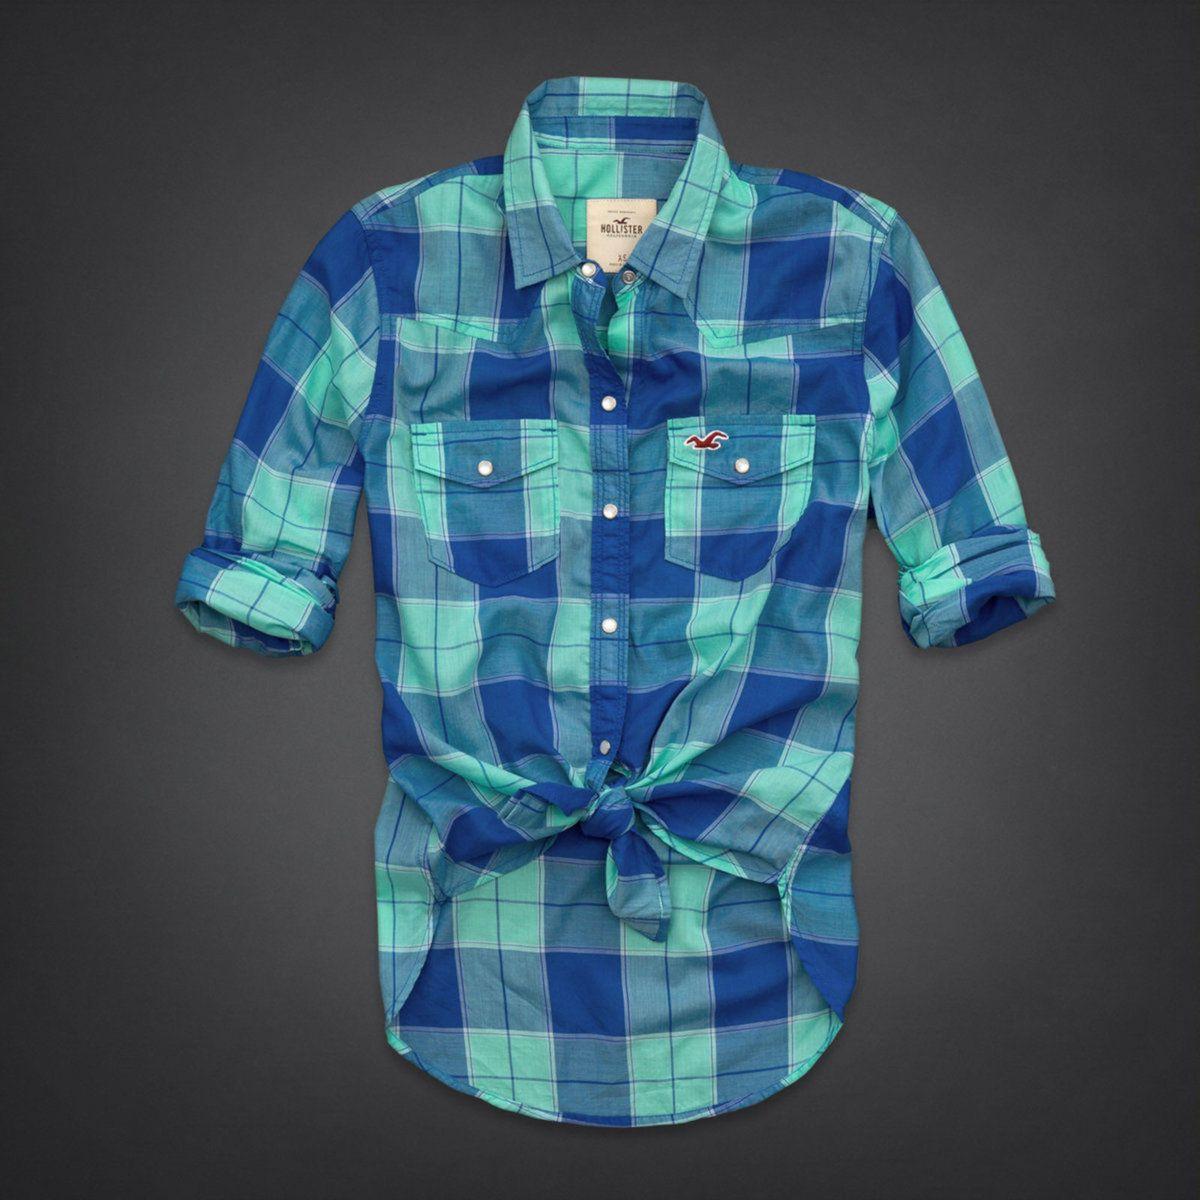 camisa xadrez hollister feminina- azul - camisas hollister co. f6c393ec48b5c